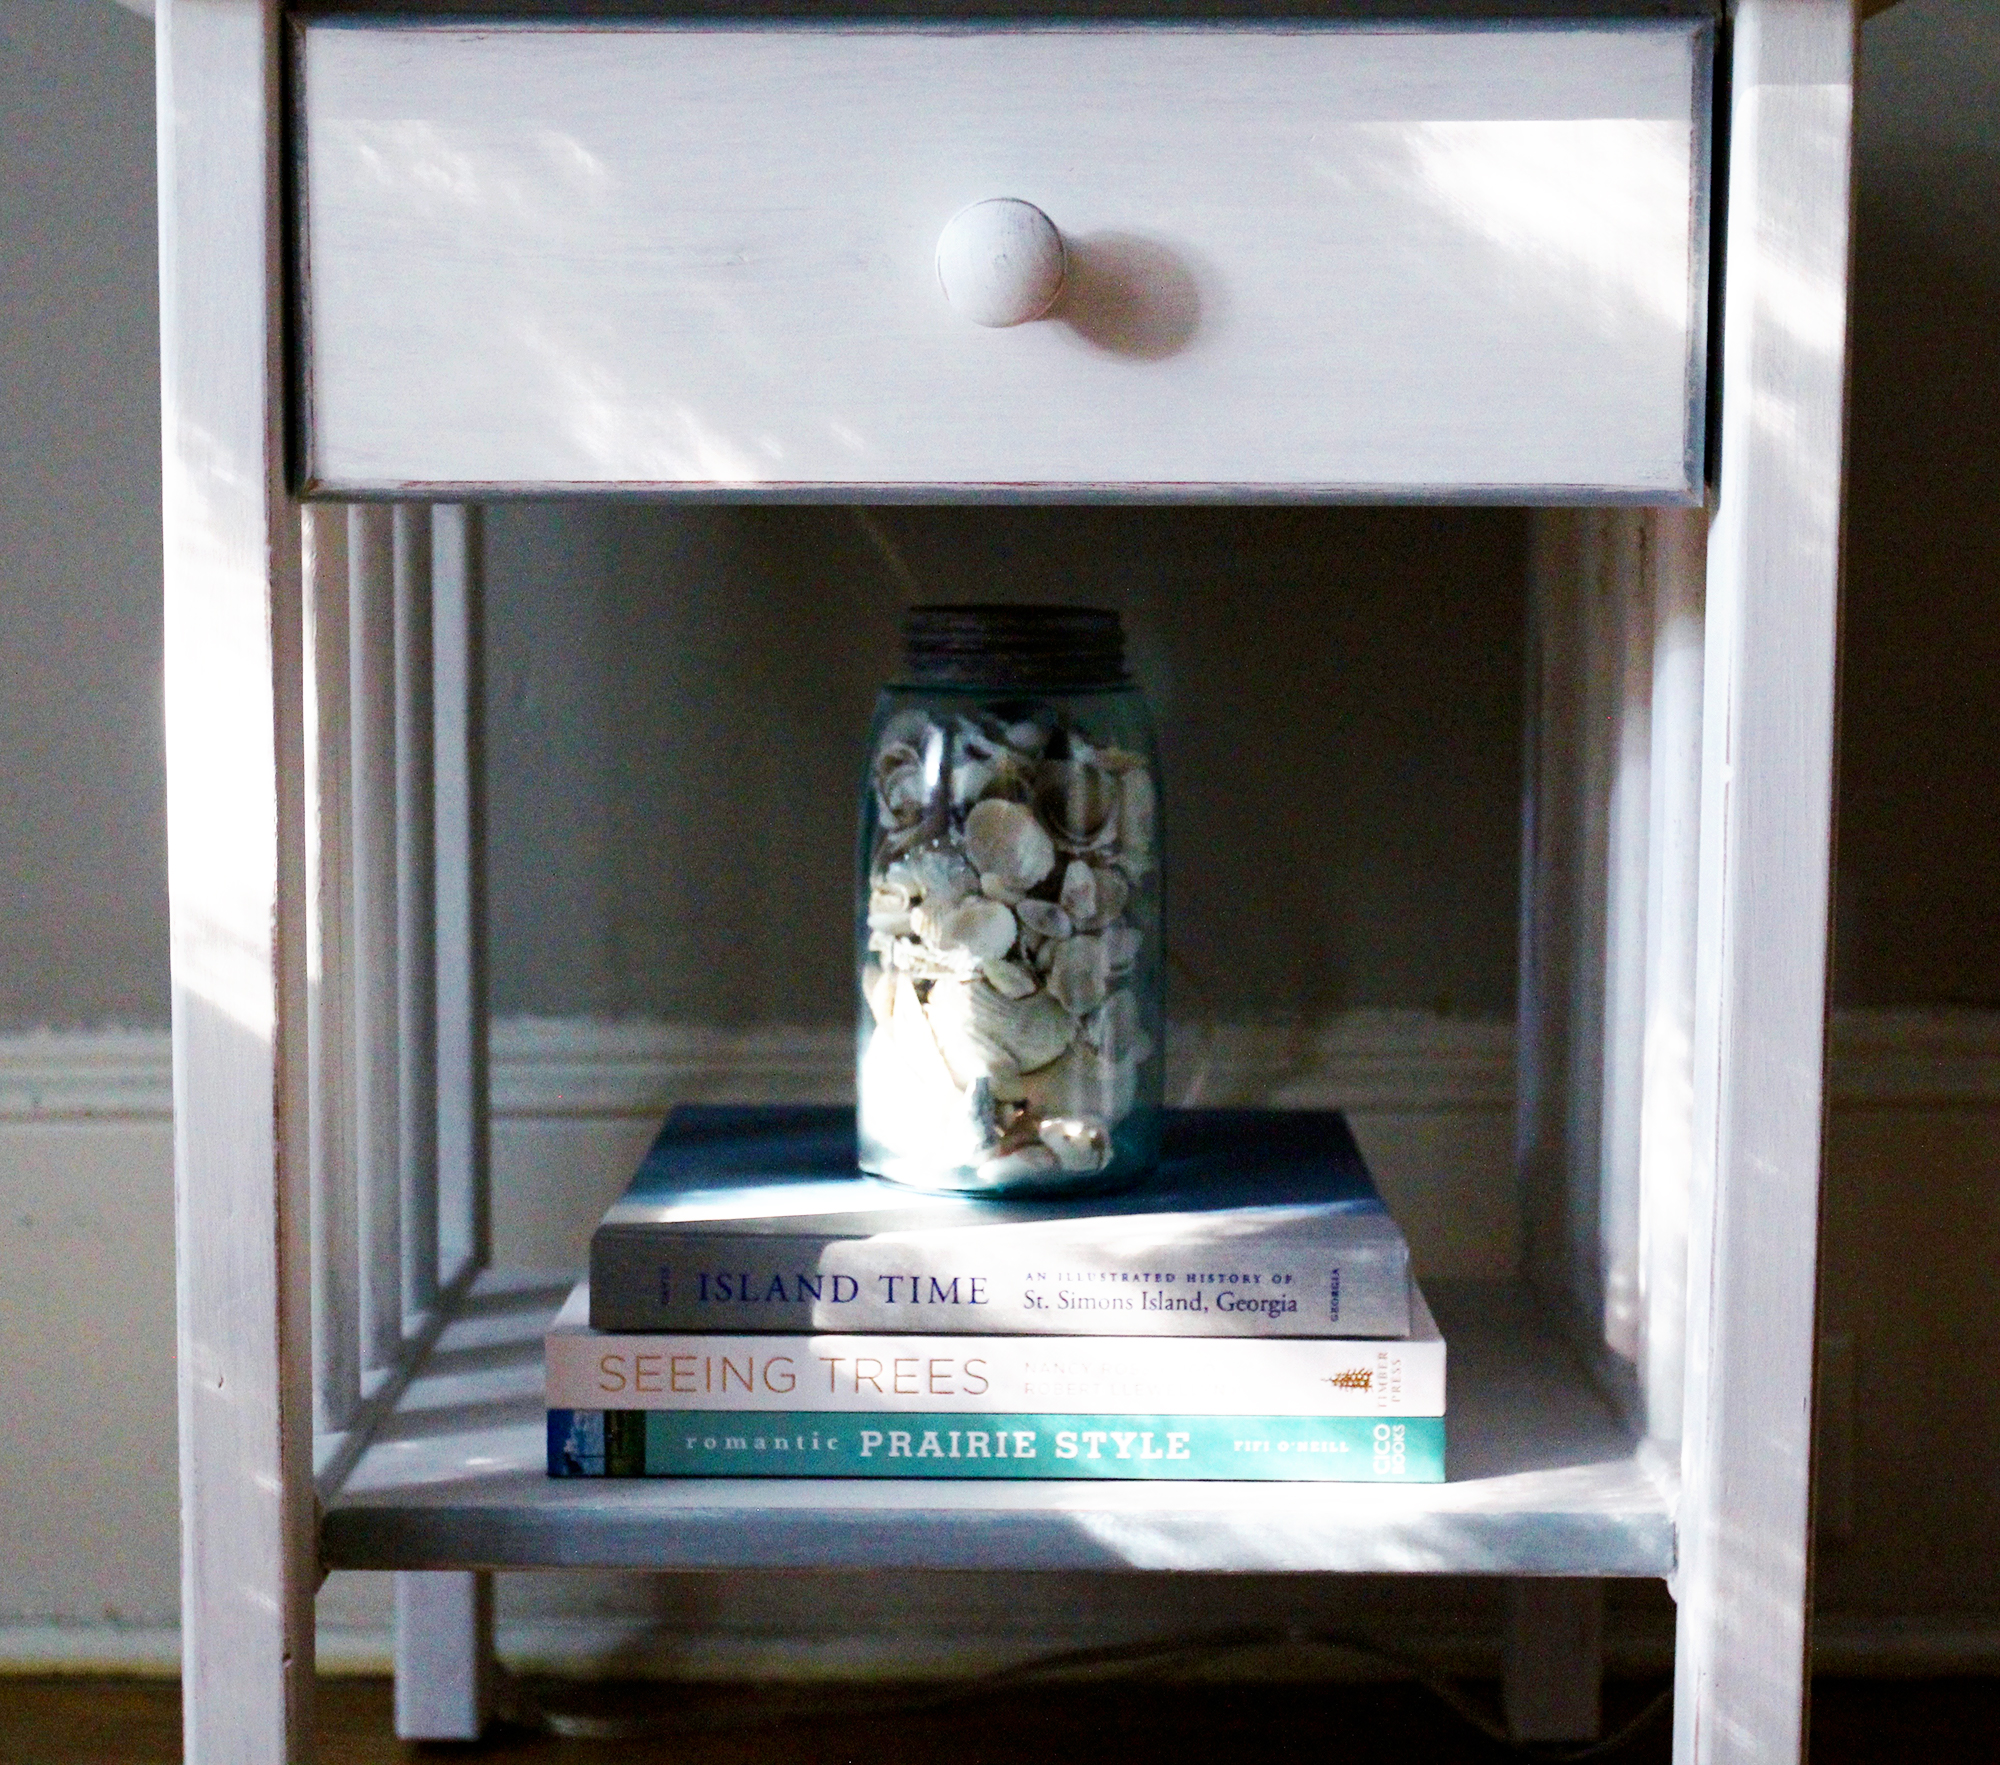 jo-torrijos-a-simpler-design-annie-sloan-pure-white-gray-trim-nightstand-atlanta-painted-furniture-7.jpg